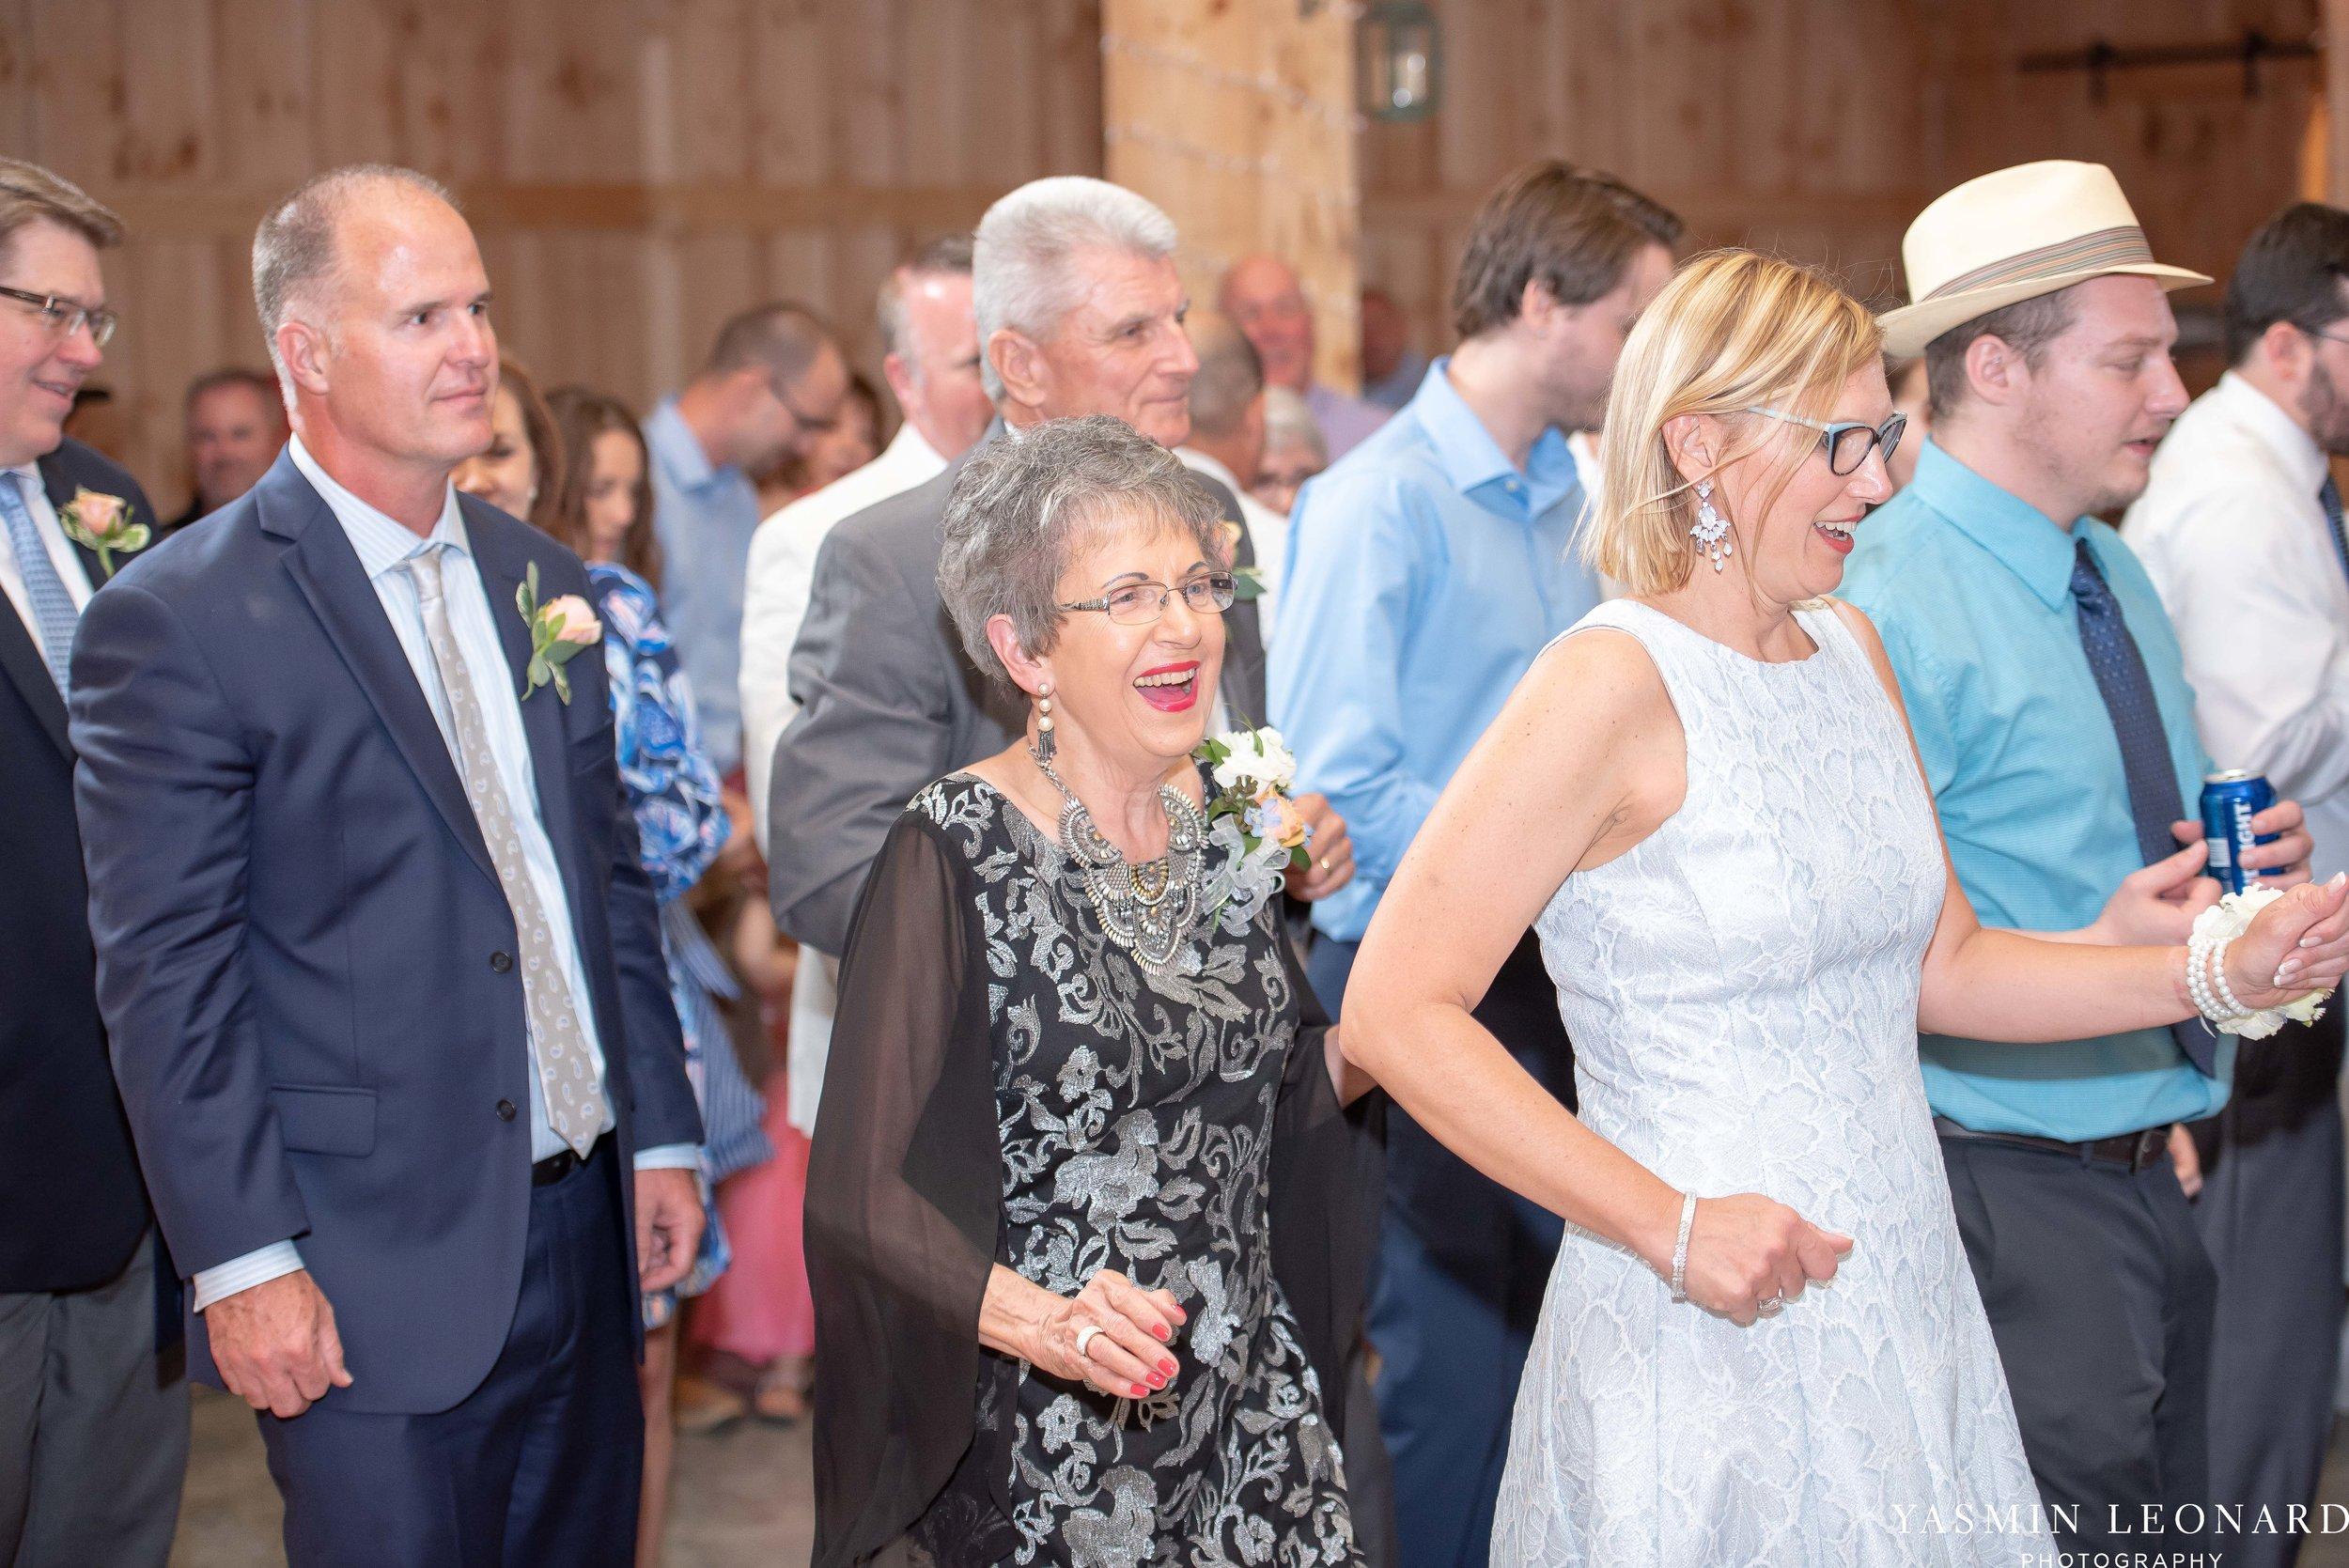 Old Homeplace Vineyard - NC Weddings - Outdoor Summer Weddings - Peony Boutique - Vineyard Wedding - NC Photographer - Yasmin Leonard Photography-77.jpg